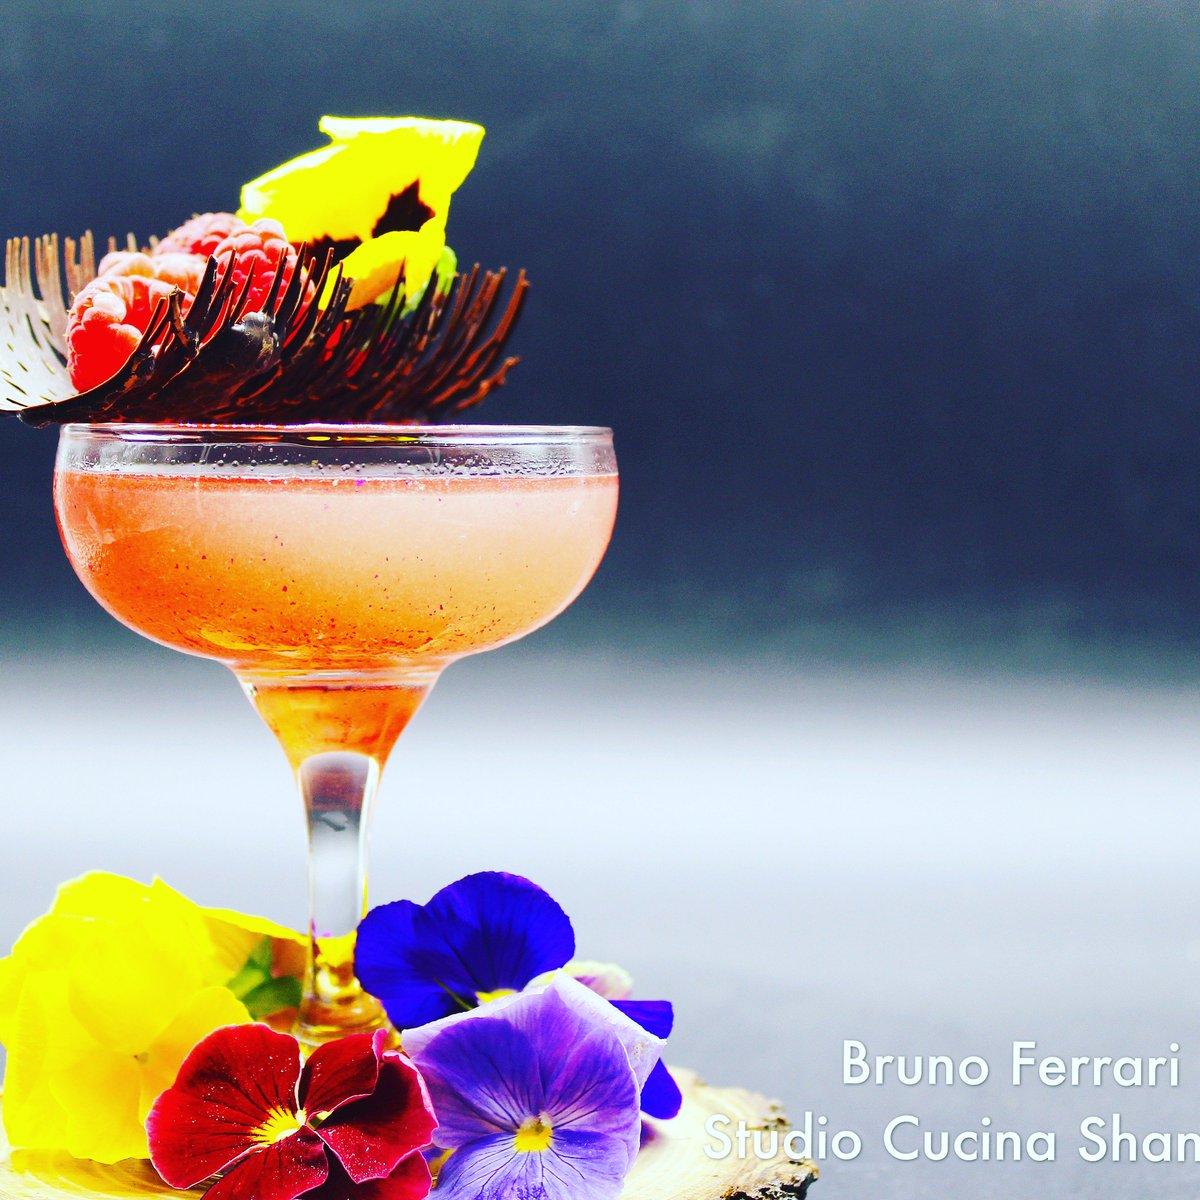 Chef Bruno Ferrari On Twitter Drink Eat By Bruno Ferrari Shanghai